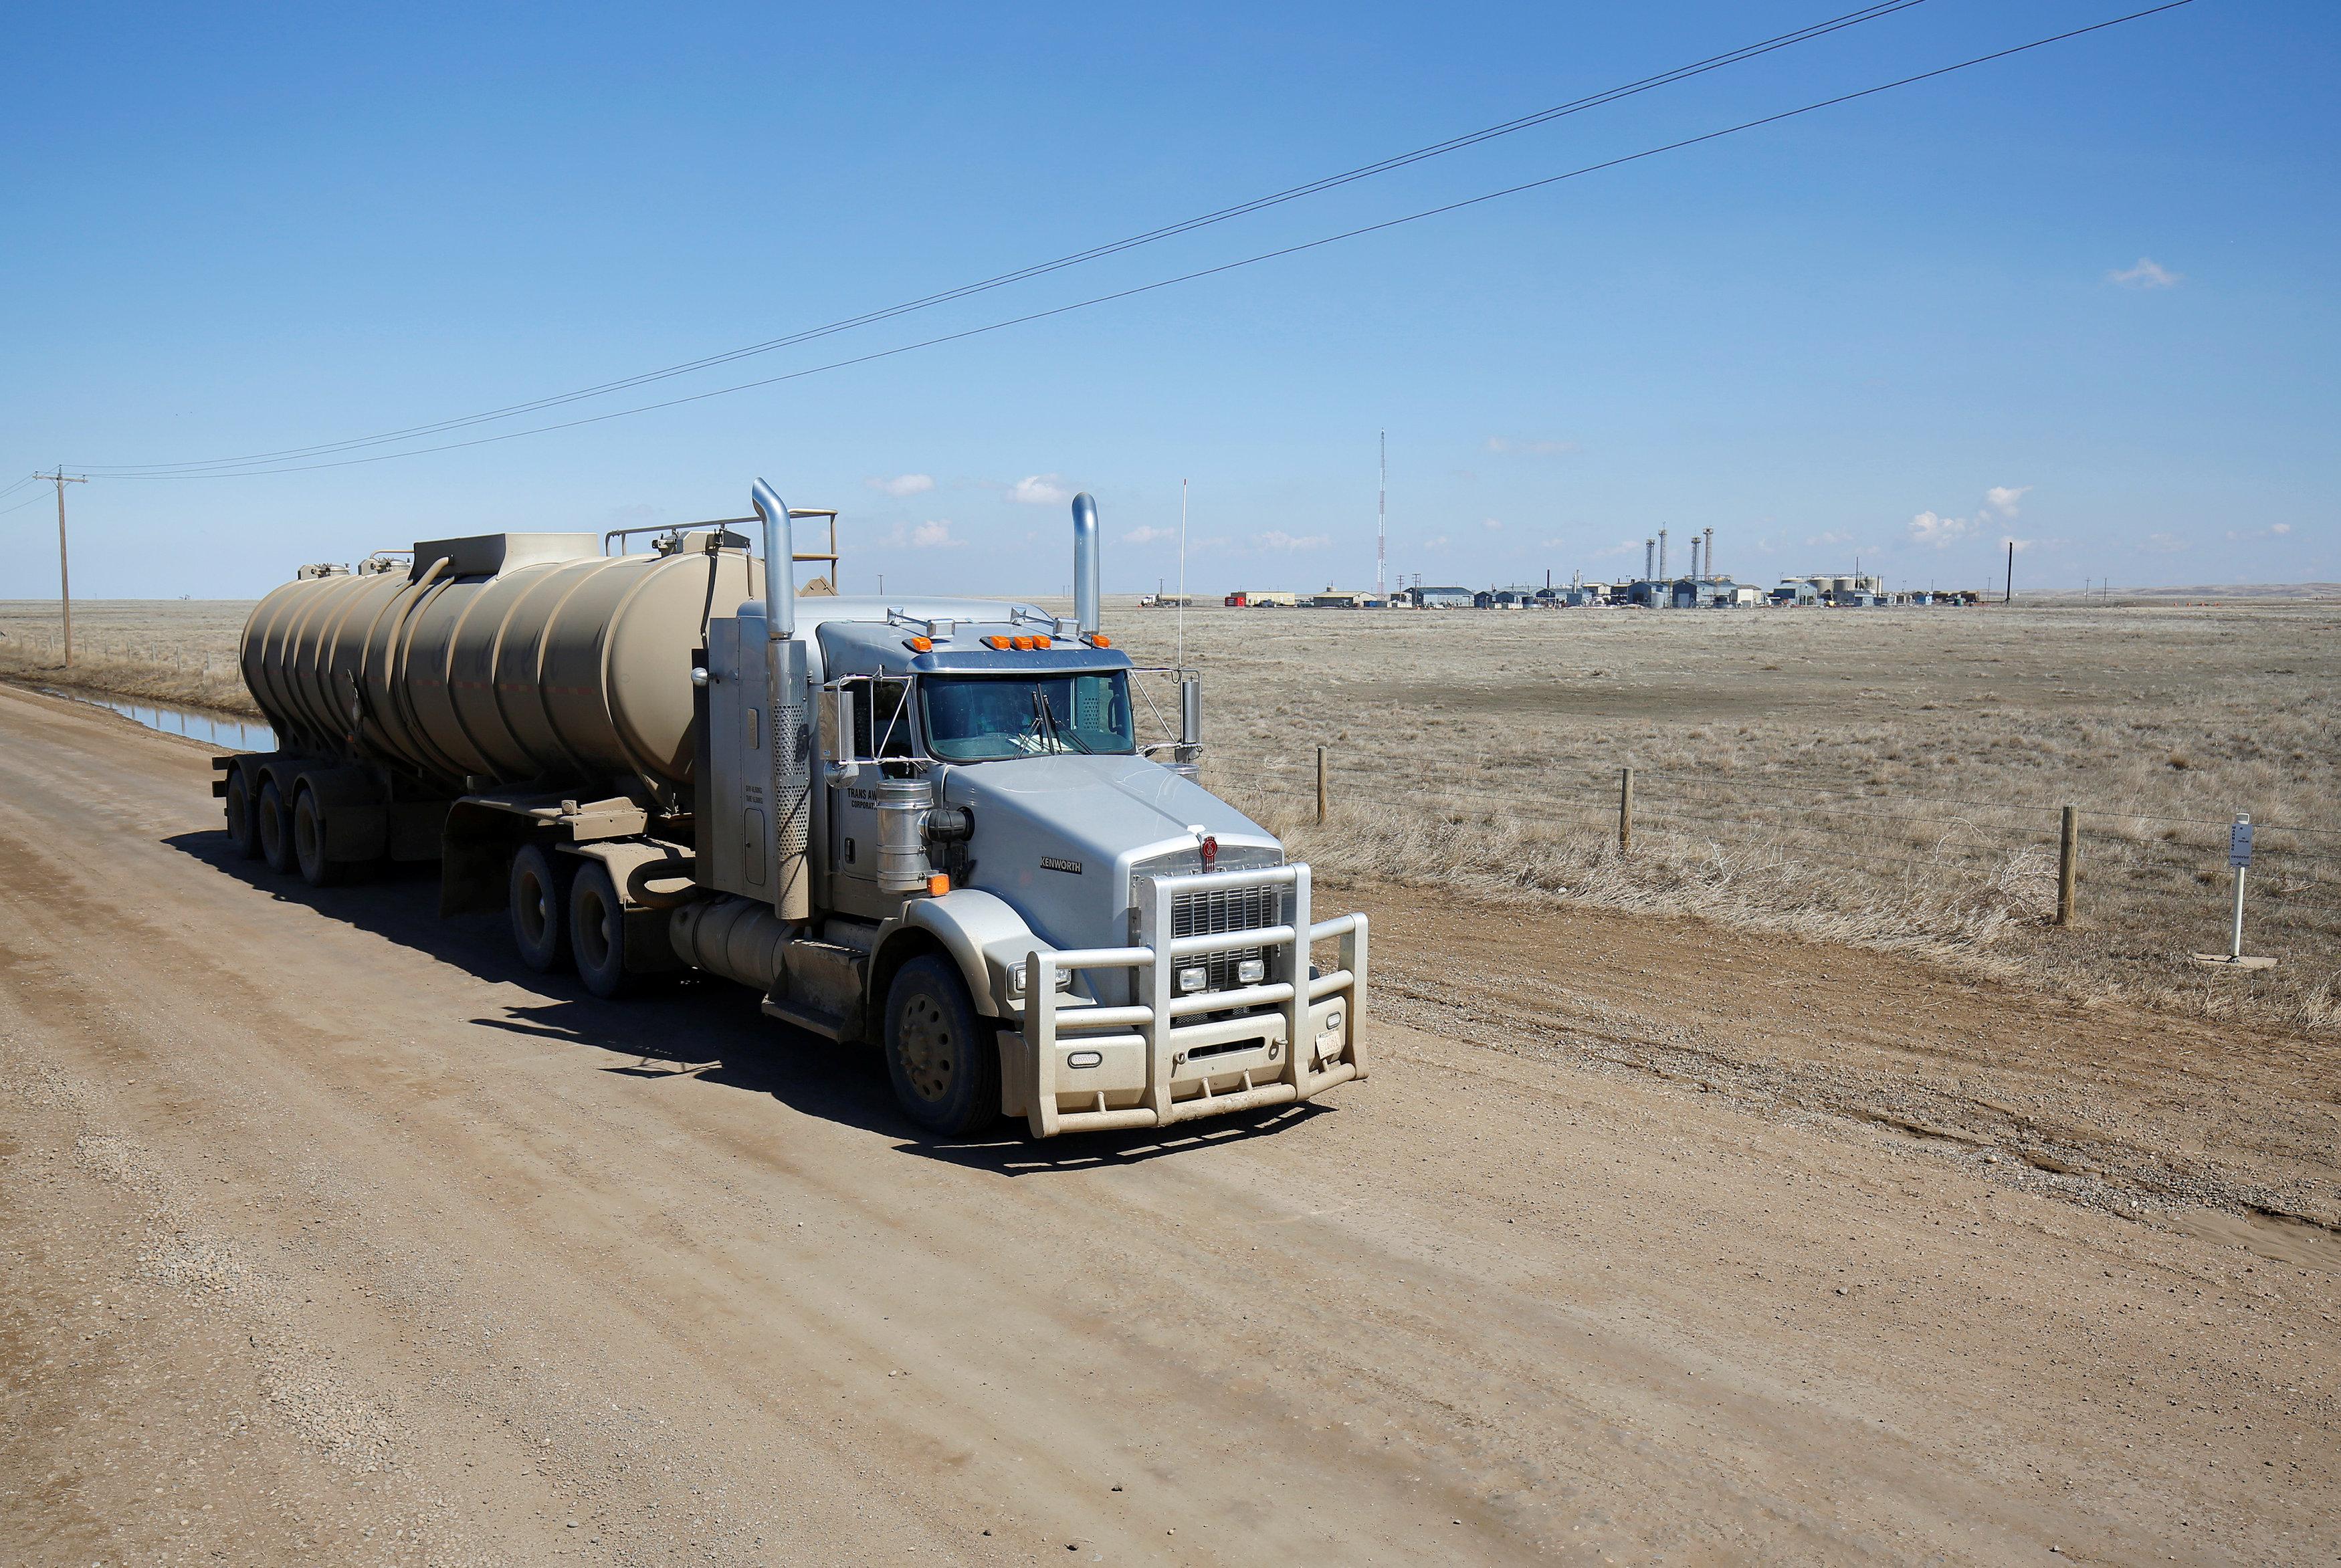 Charming Alberta Truck Trader Gallery - Classic Cars Ideas - boiq.info